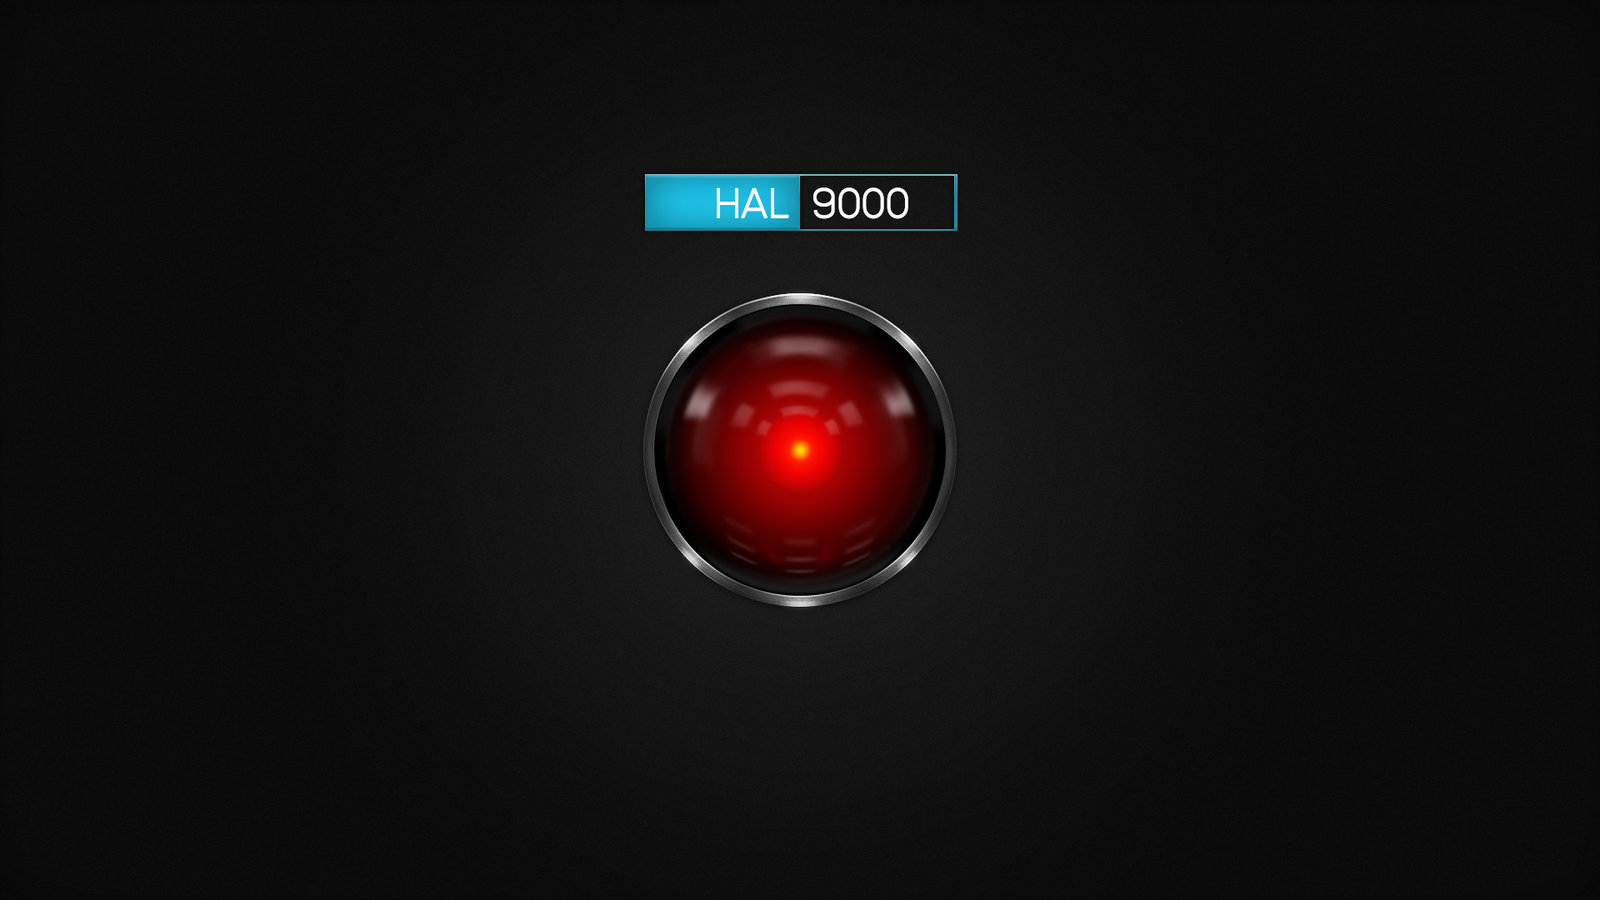 Hal 9000 HD Wallpaper